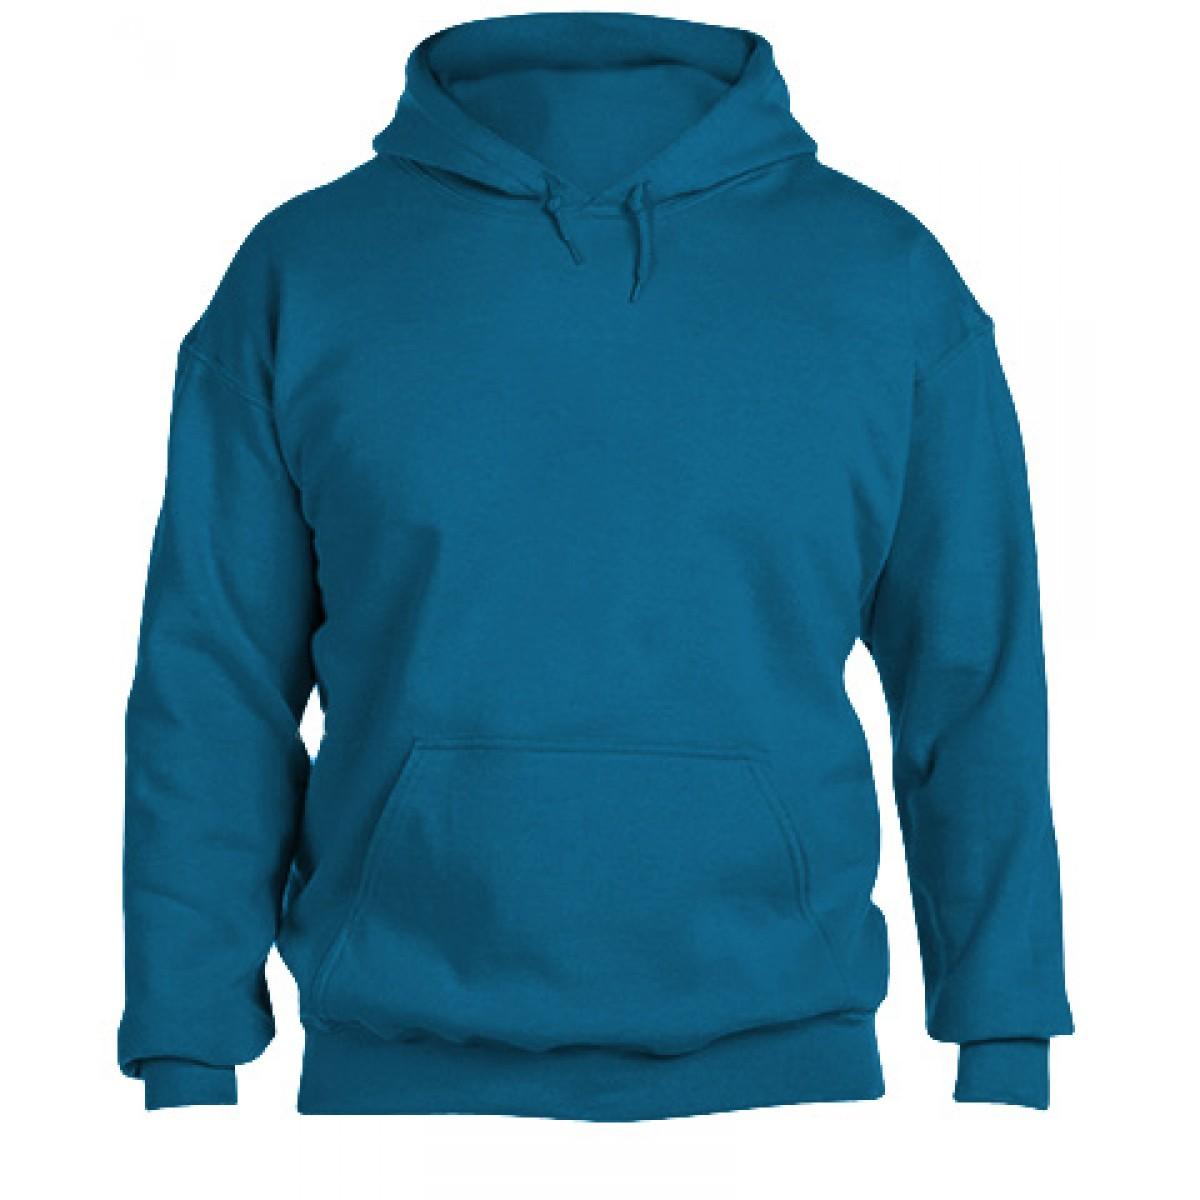 Hooded Sweatshirt 50/50 Heavy Blend -Sapphire-2XL